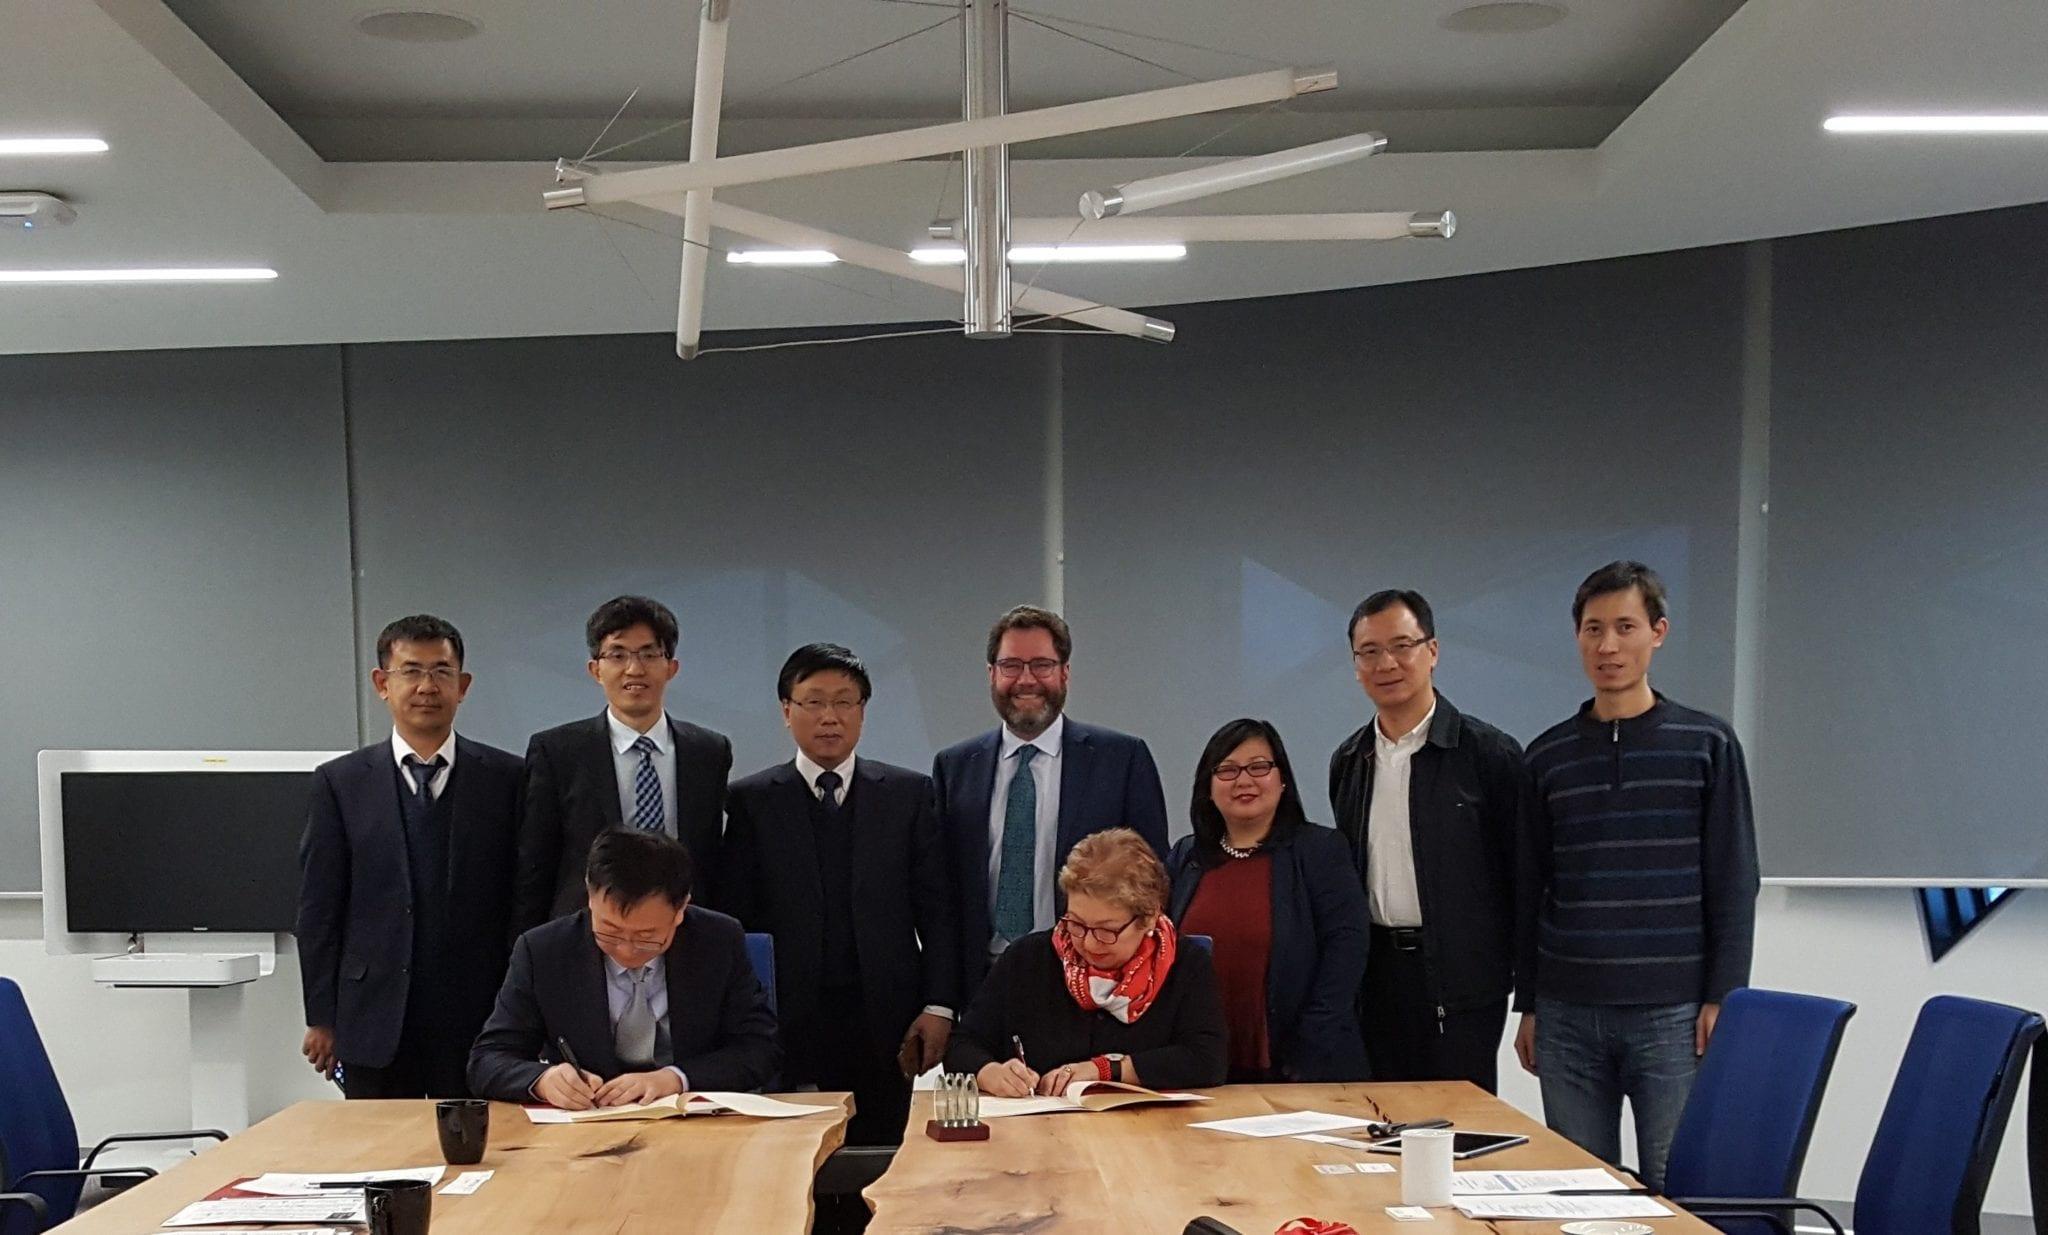 Vice-President Dr. Xinjun Li and York AVP International Dr. Marilyn Lambert-Drache sign MOU, Jan 2018